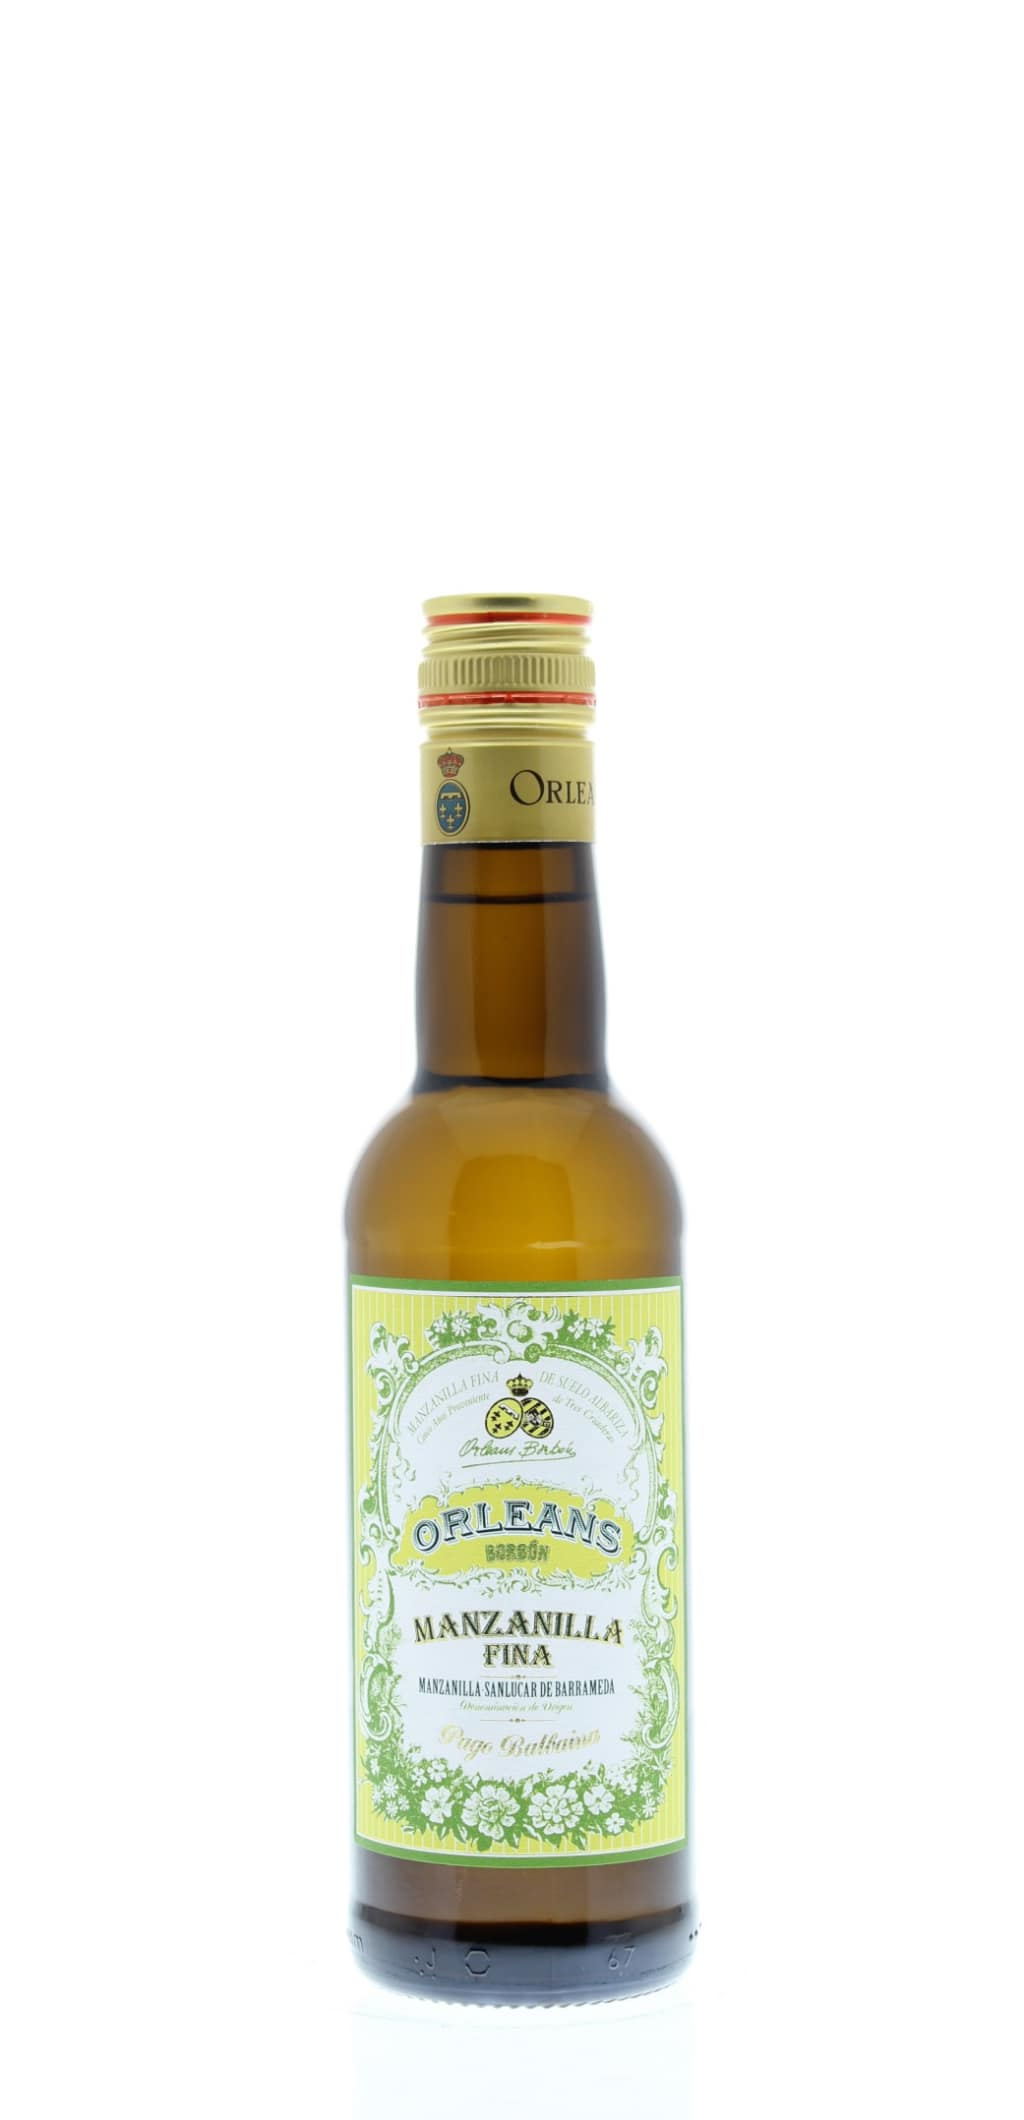 Orleans Borbon Manzanilla Sherry (375ML half-bottle)